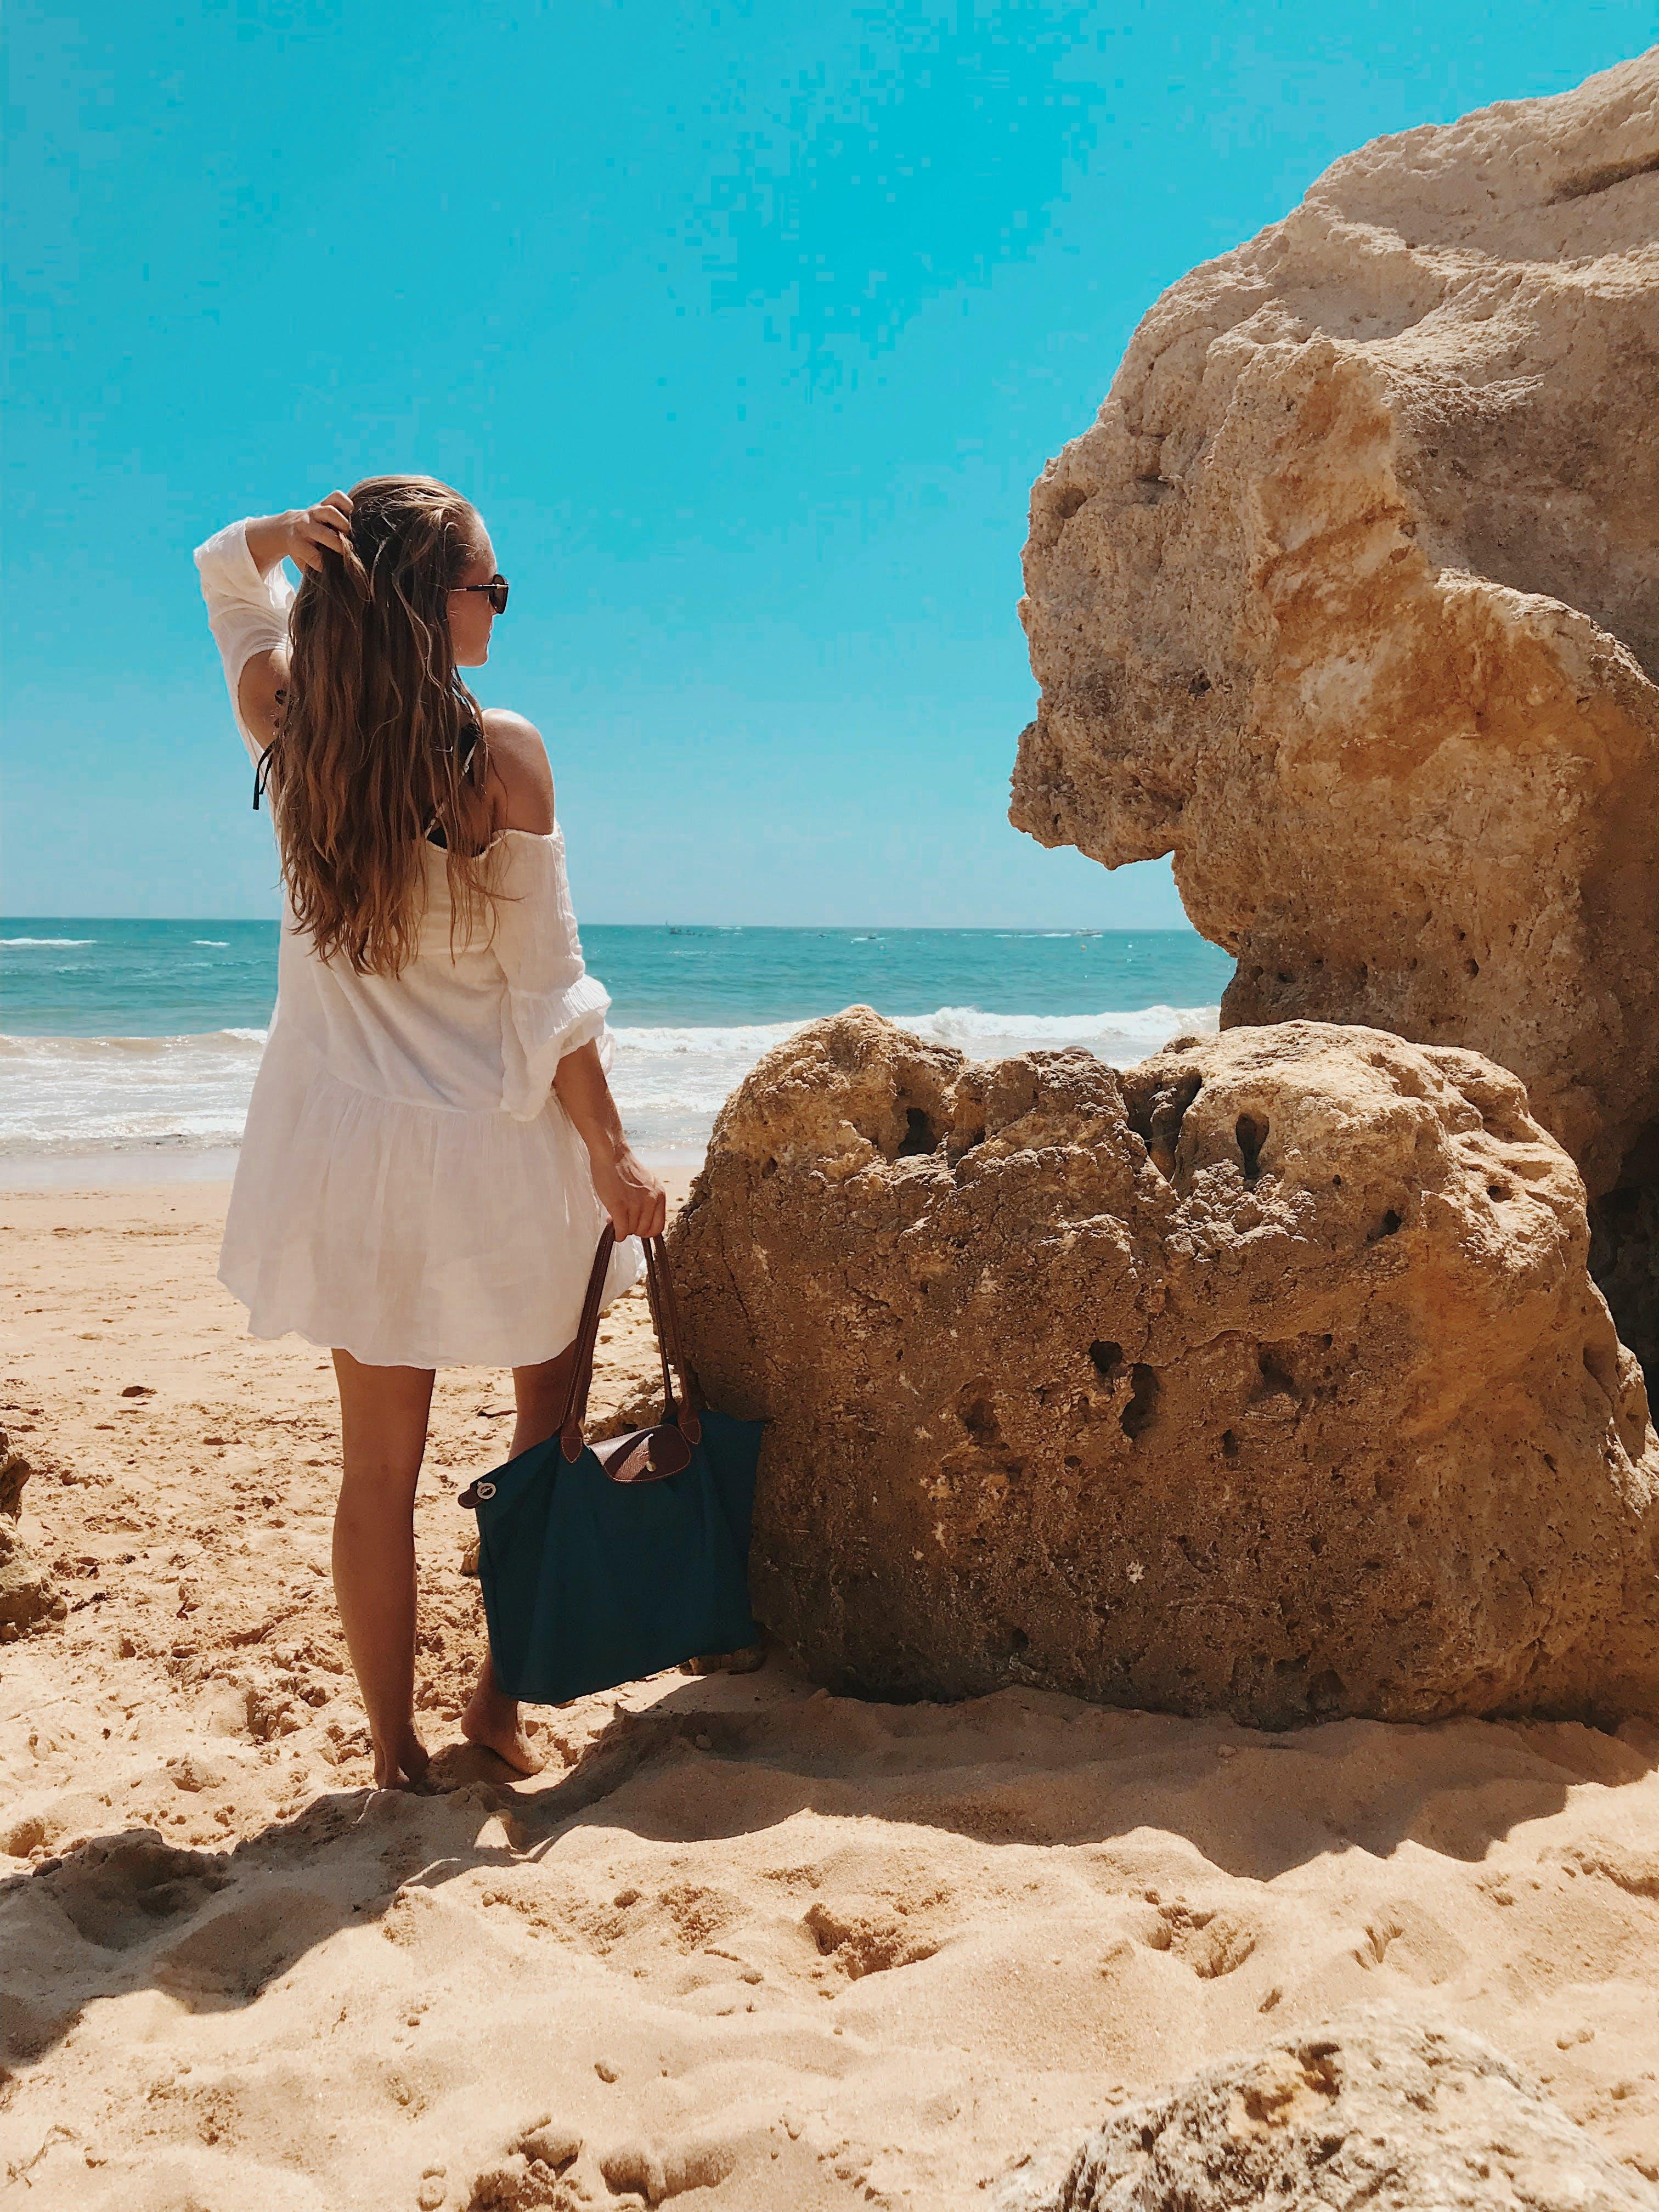 Woman Standing Beside Rocks Near Beach